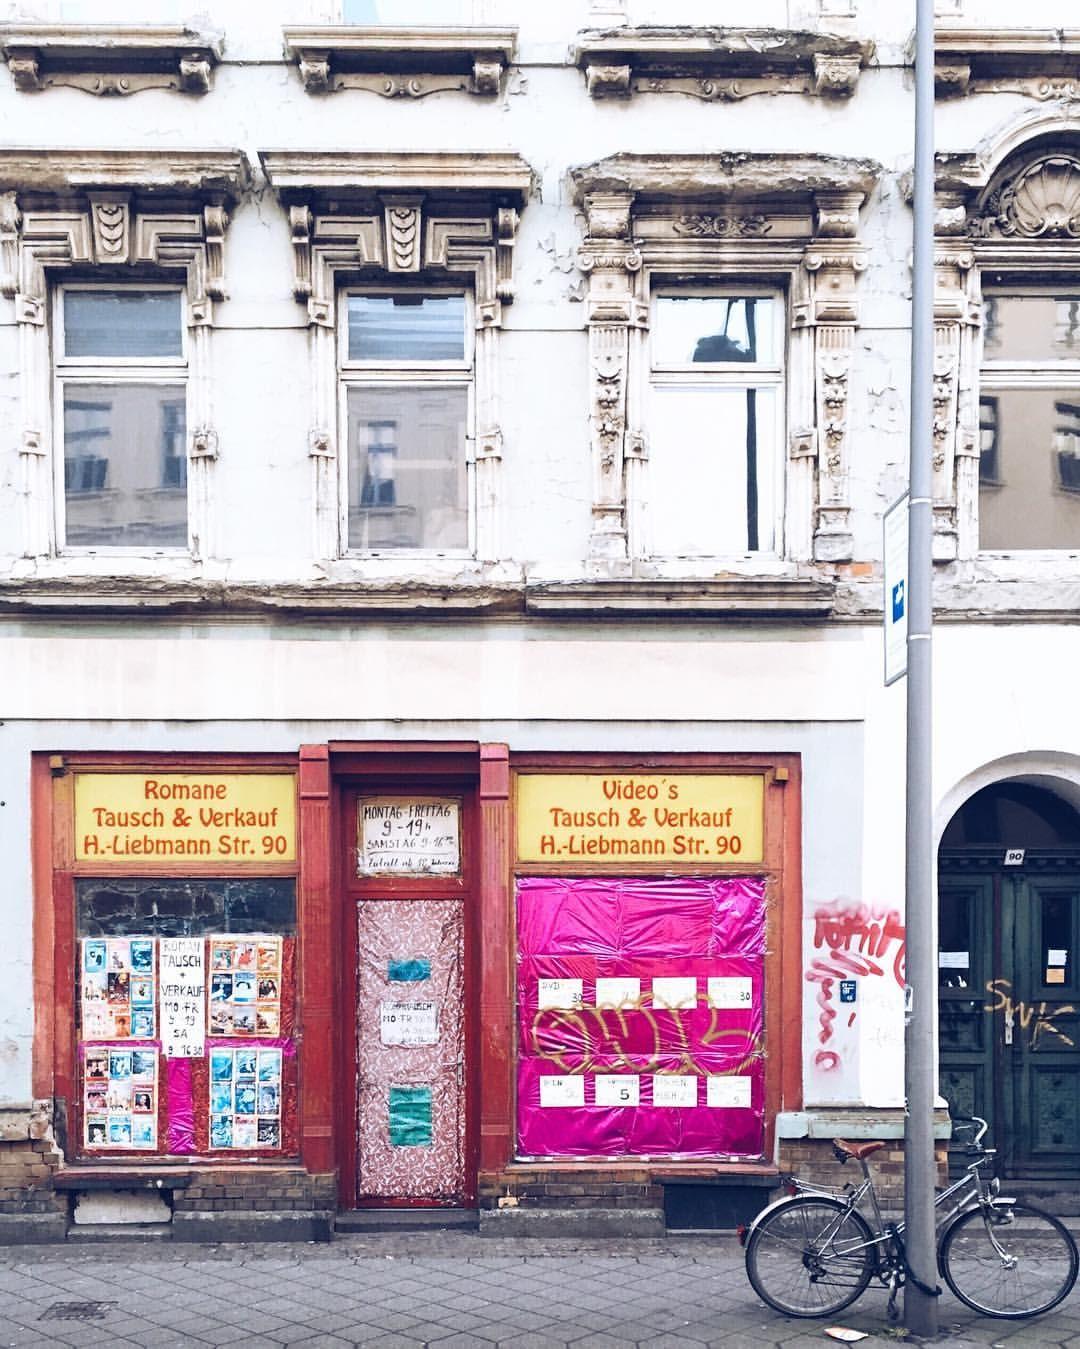 Tausch & Verkauf  #leipzig #lieblingsleipzig #urban #leipzigerverfall #urbanromantix #diewocheaufinstagram #thecreatorclass #jointheclass #createexplore #way2ill #illgrammers #agameoftones